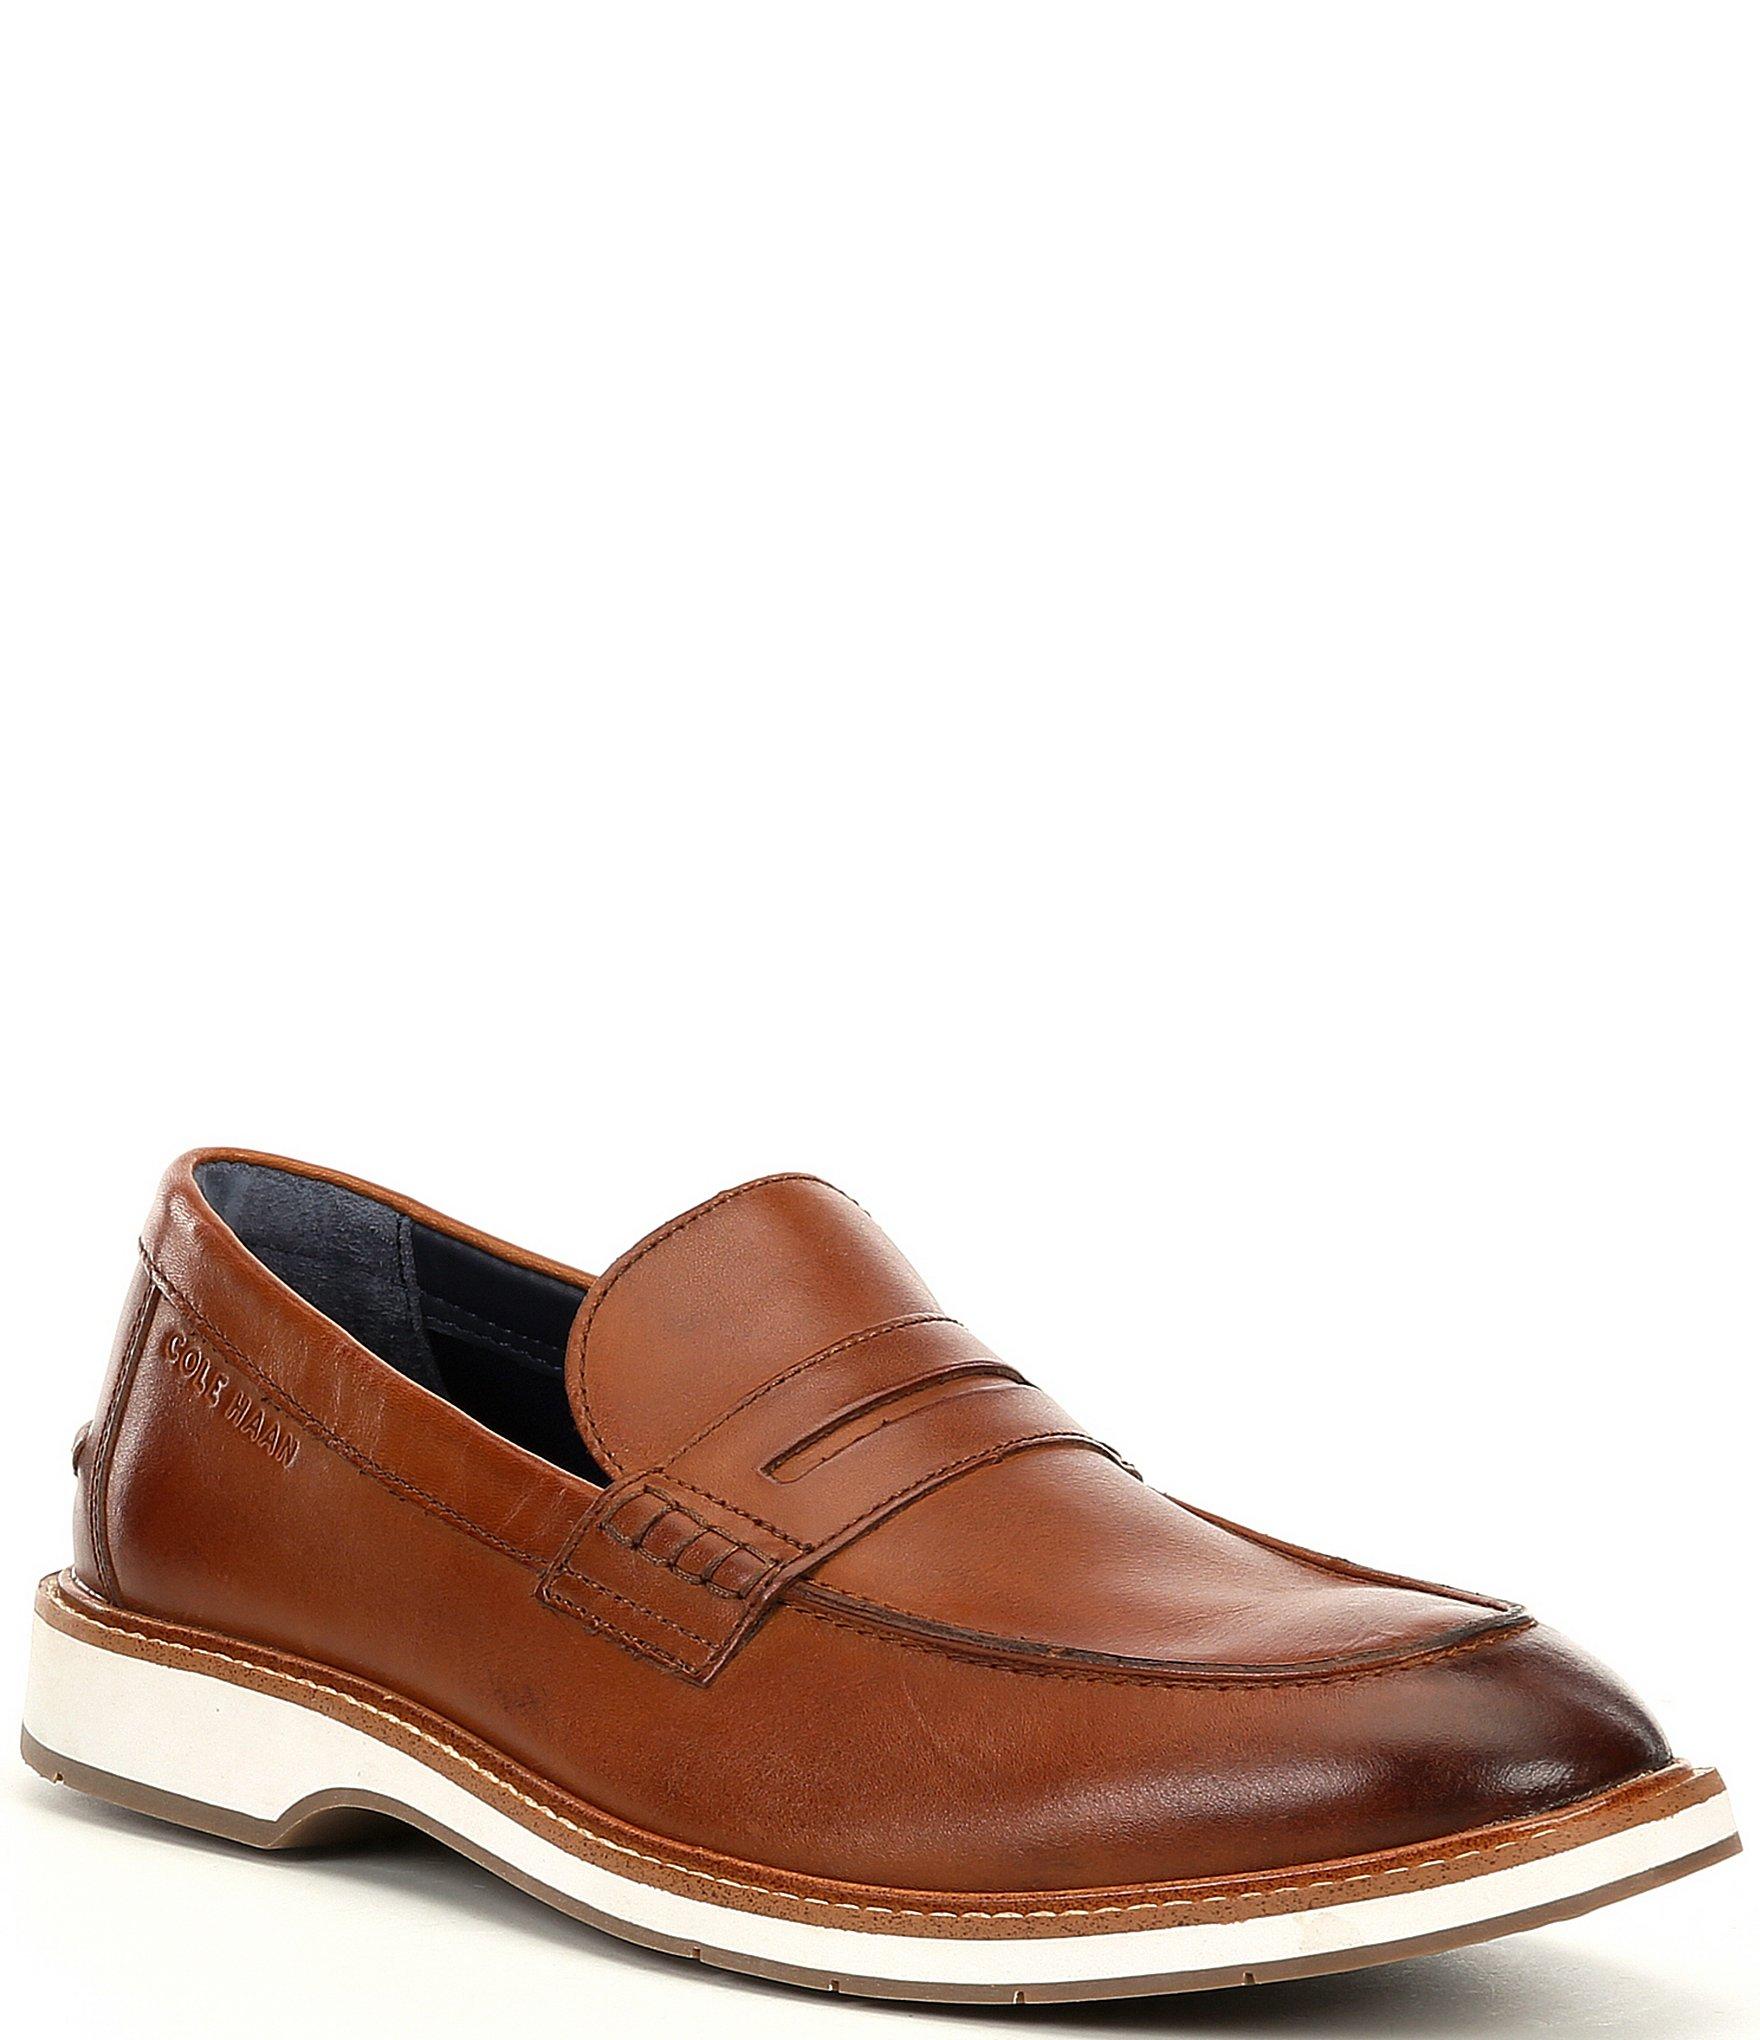 Cole Haan Men's Morris Leather Penny